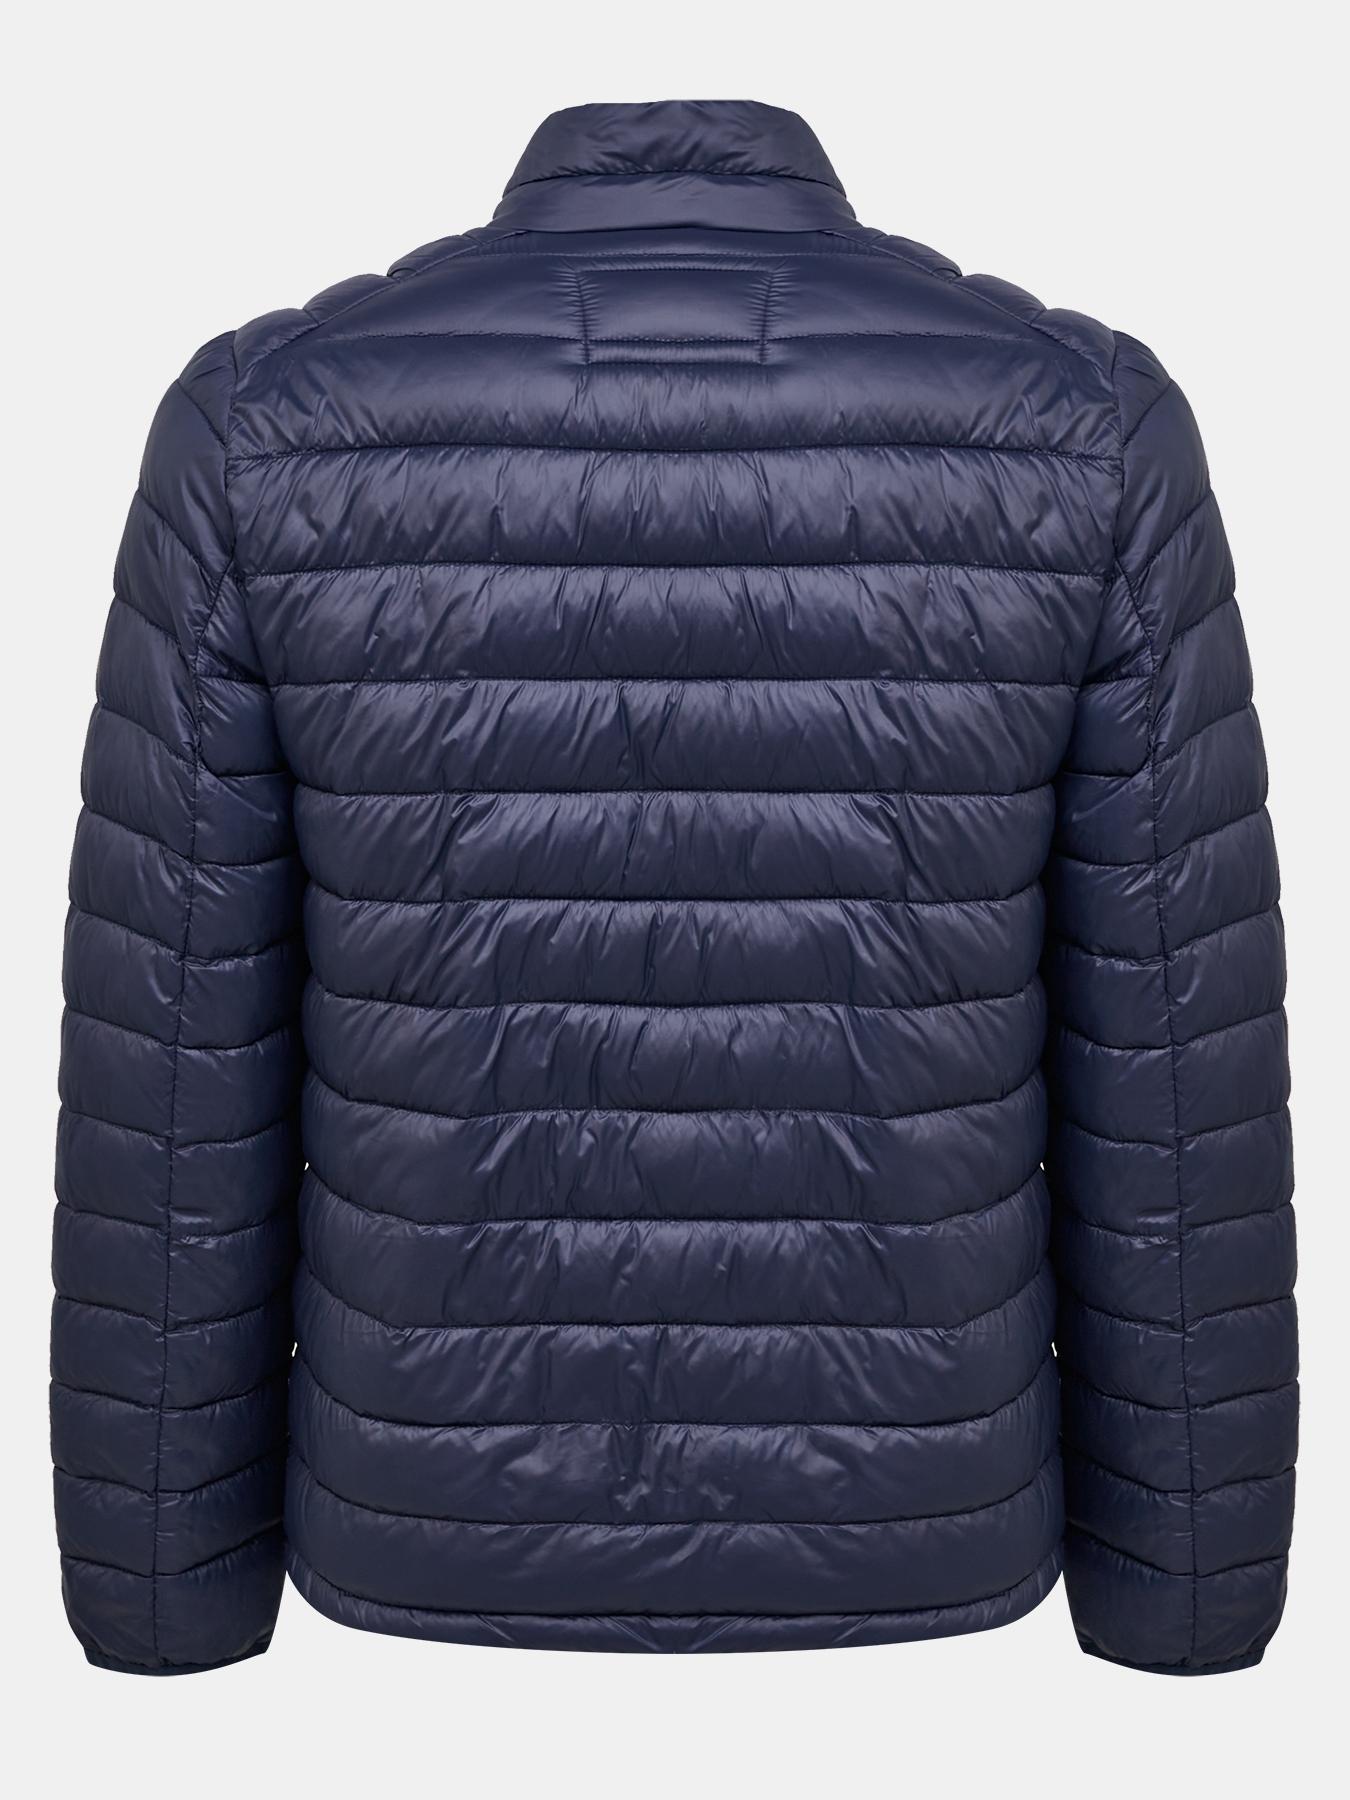 Куртка Karl Lagerfeld Куртка куртка karl lagerfeld стеганая куртка